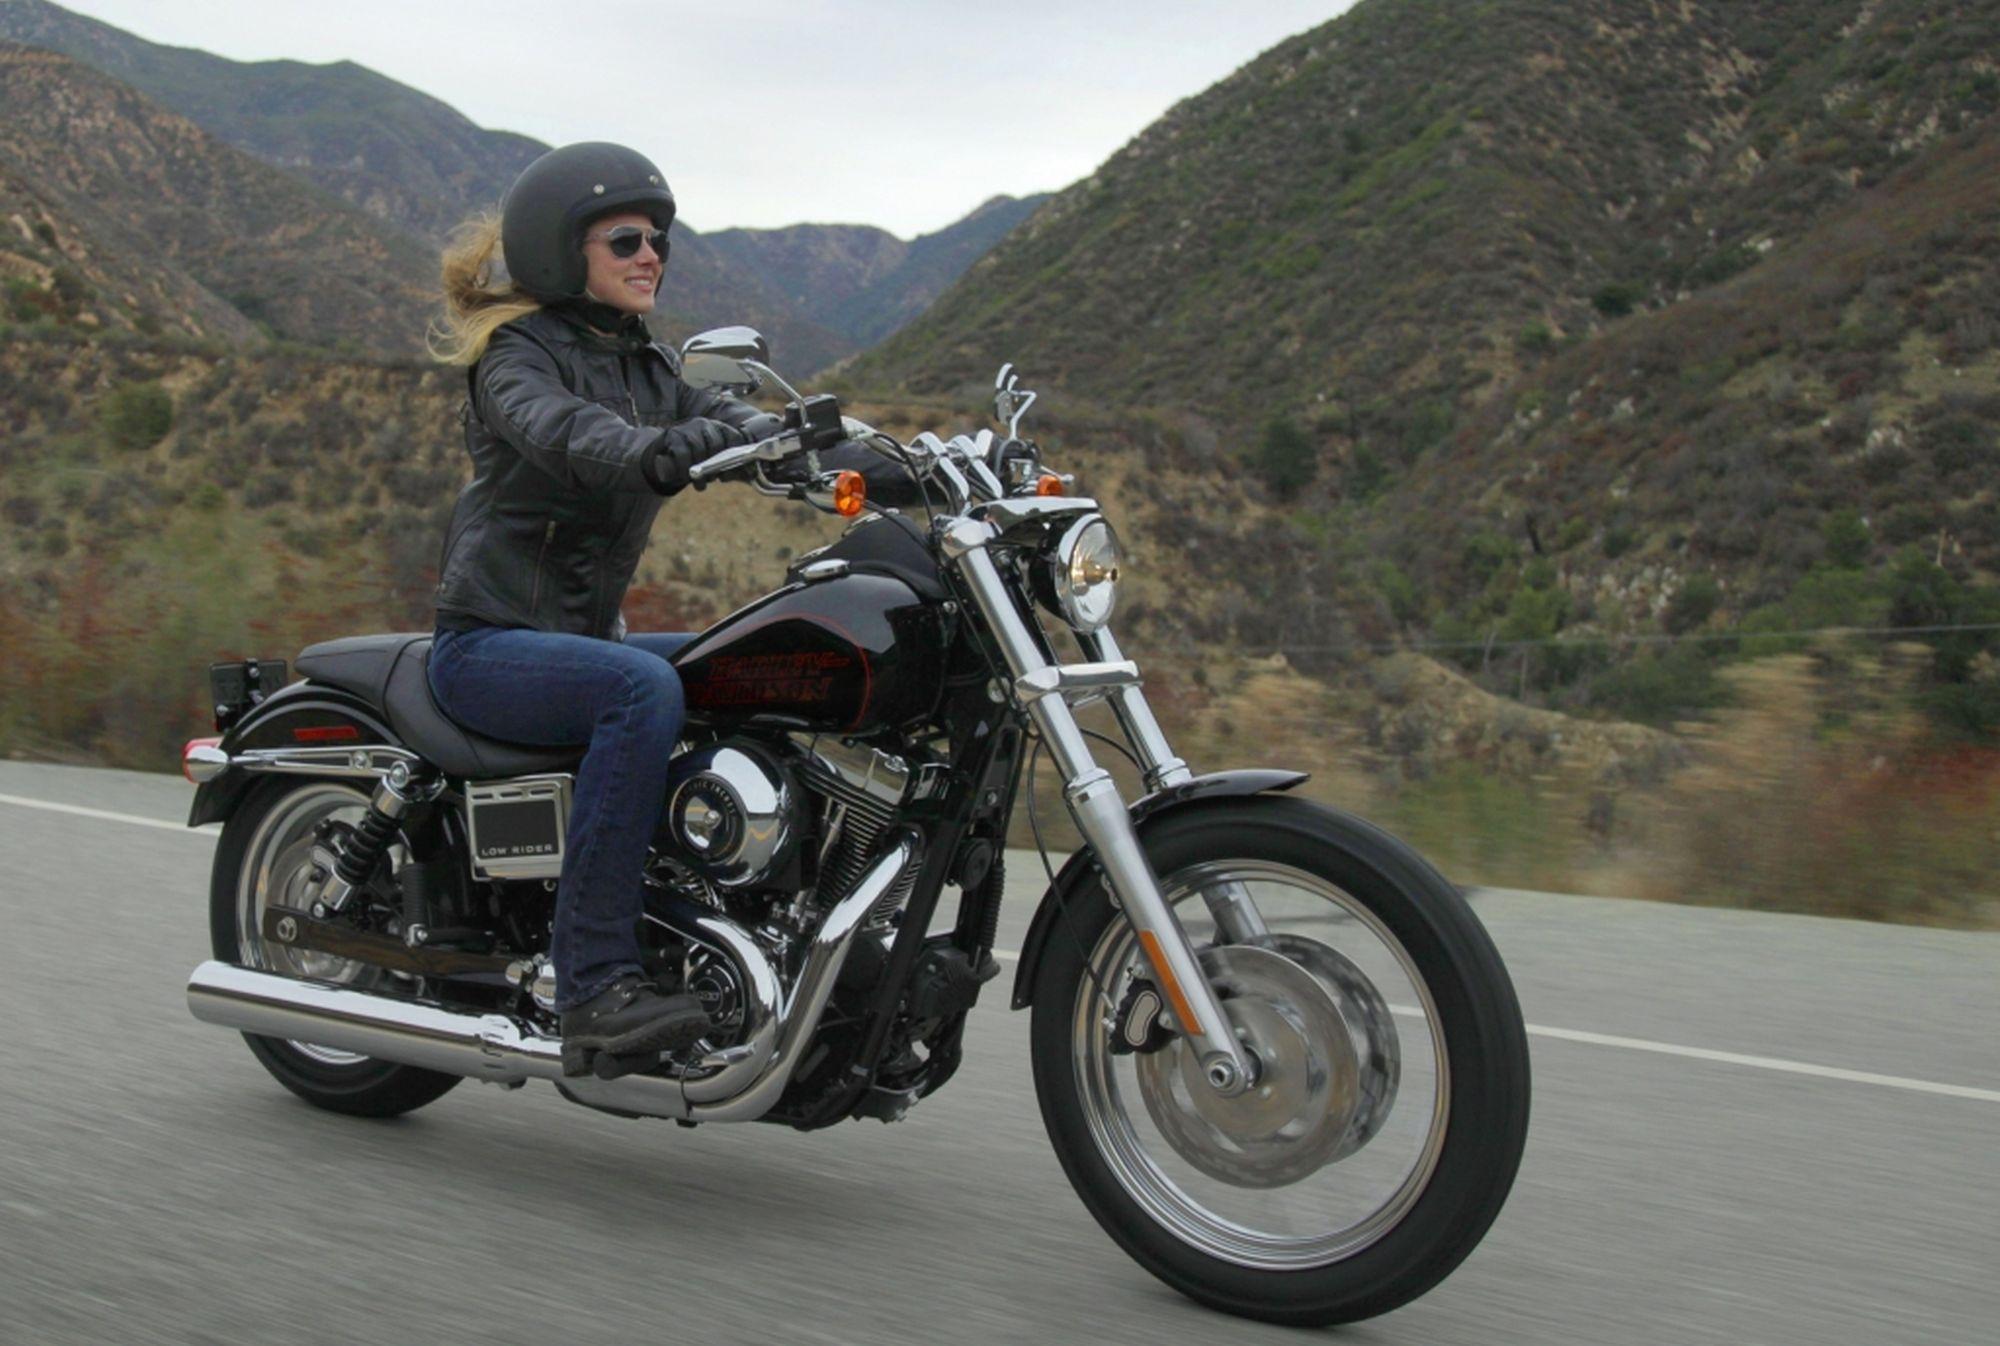 2017 Dyna Low Rider   Harley-Davidson USA - HD Wallpapers